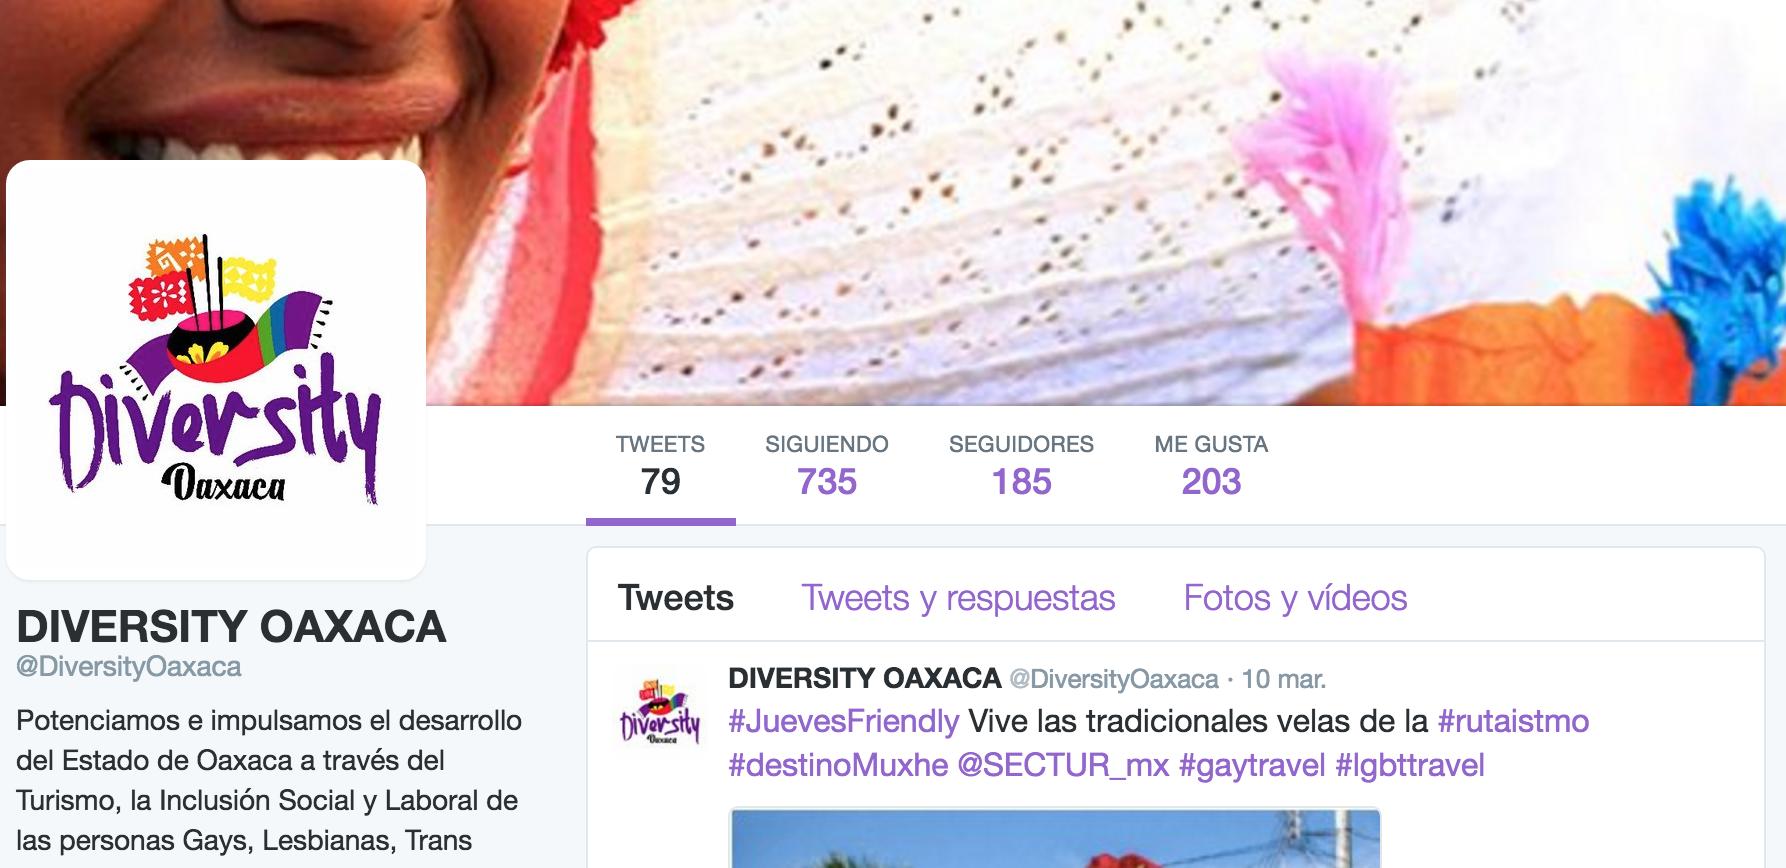 Diversity Oaxaca